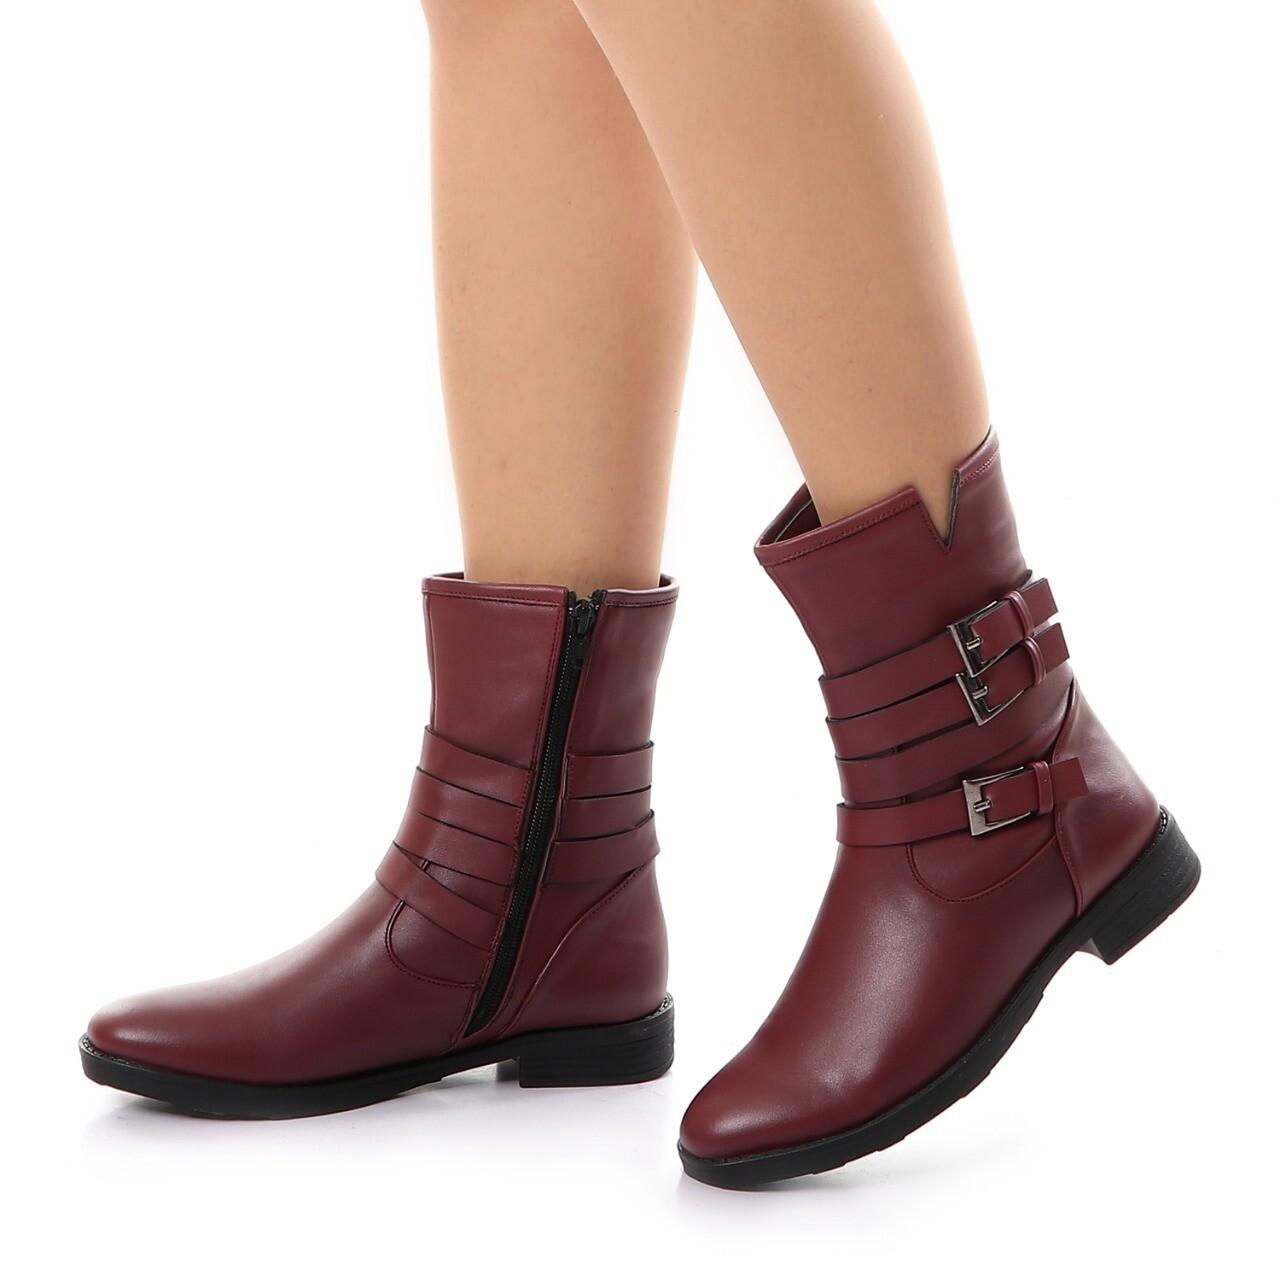 3739 Half Boot - BURGHANDY